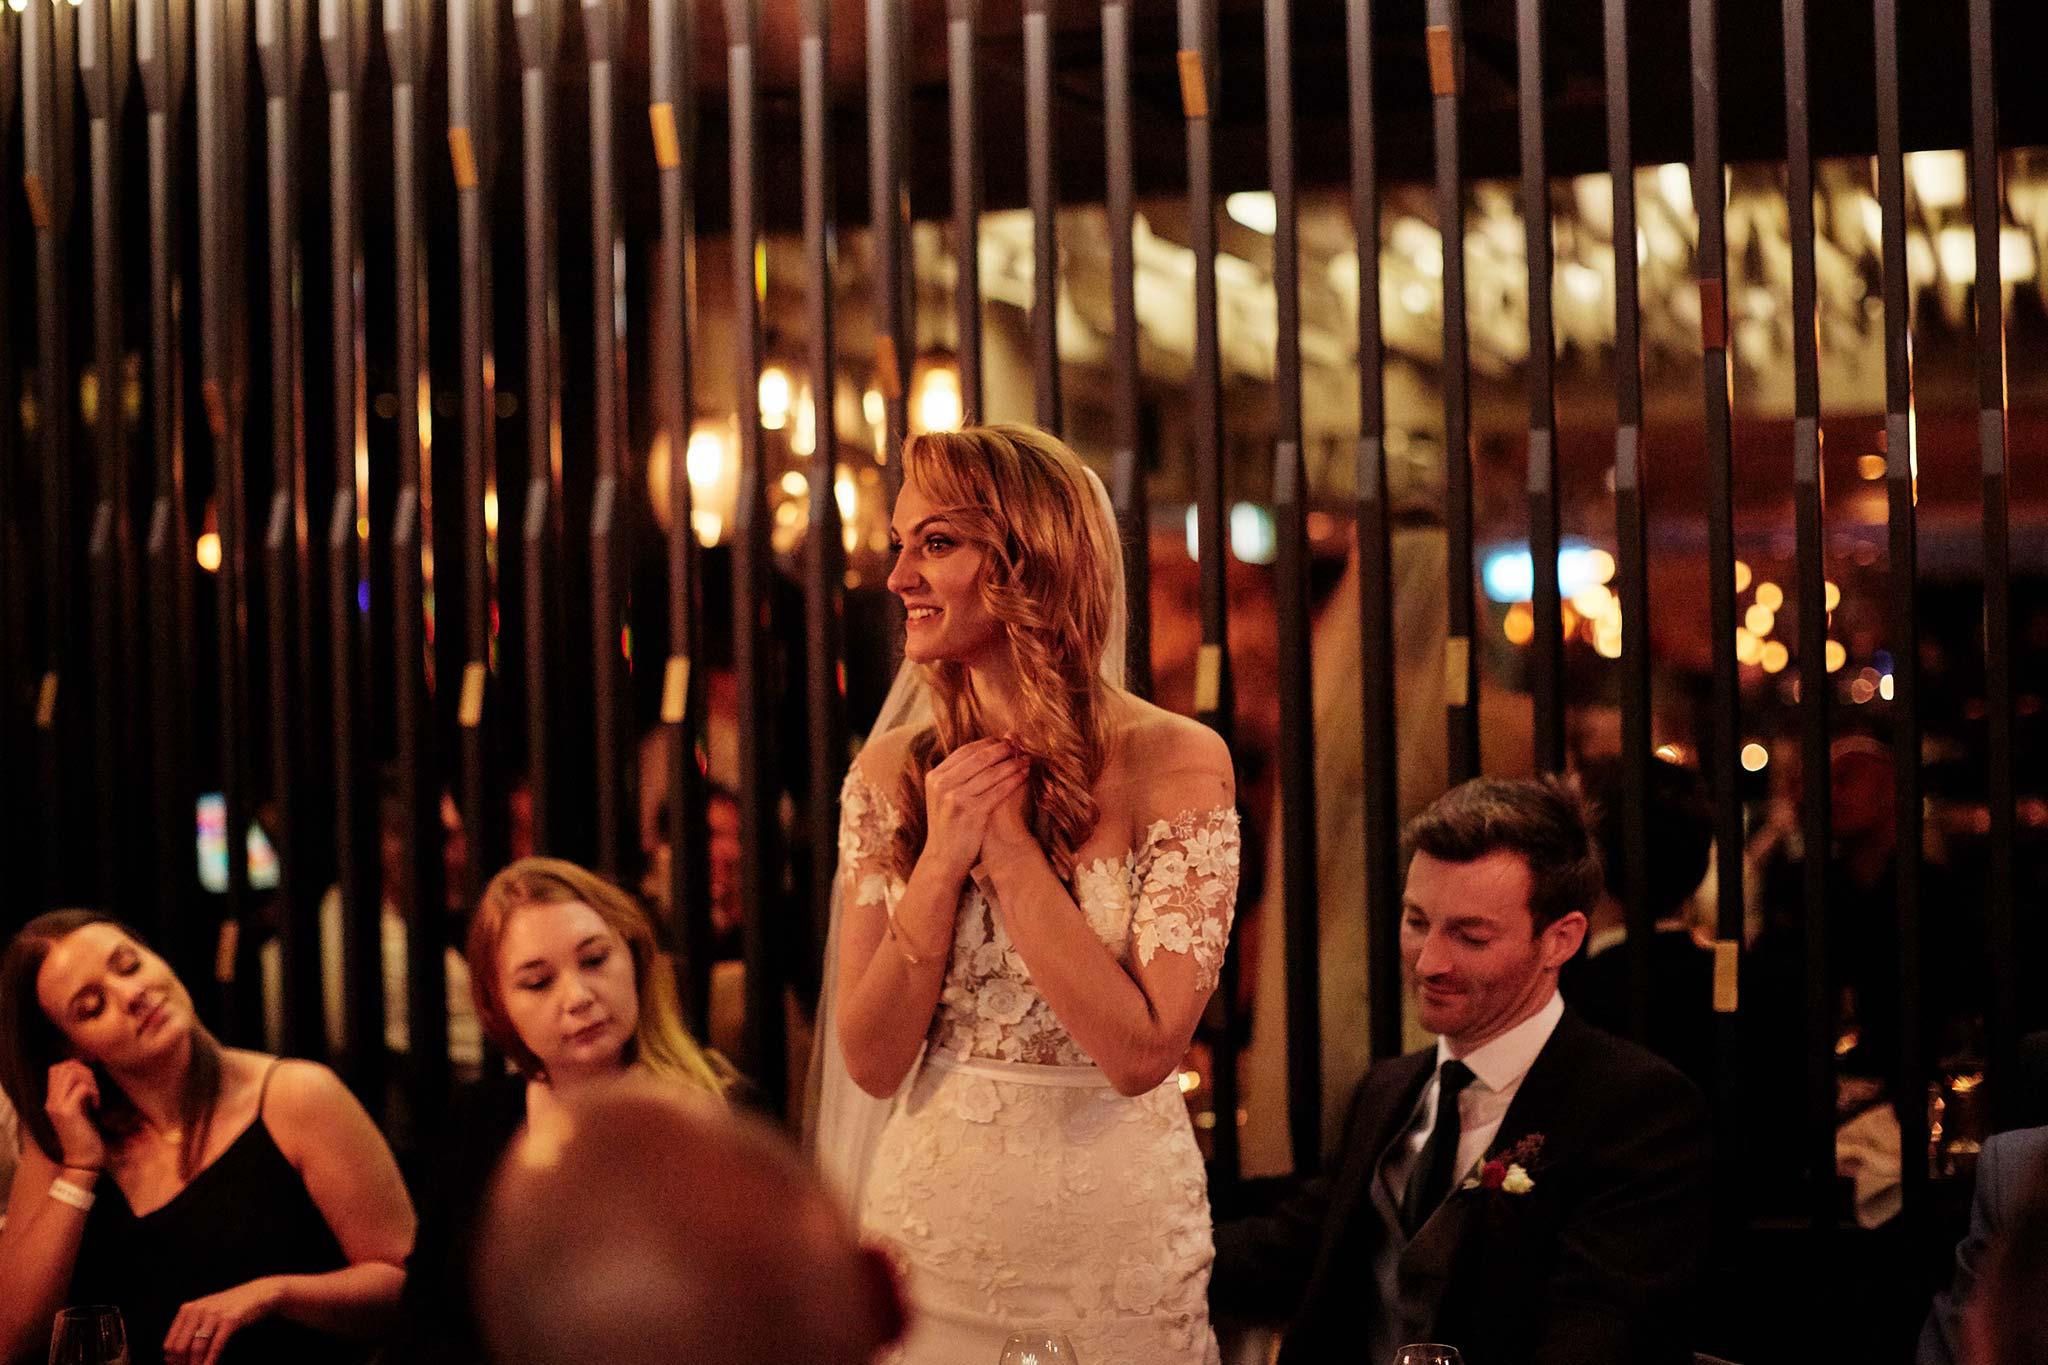 Melbourne-tour-bus-wedding-bride-maha-reception-speech